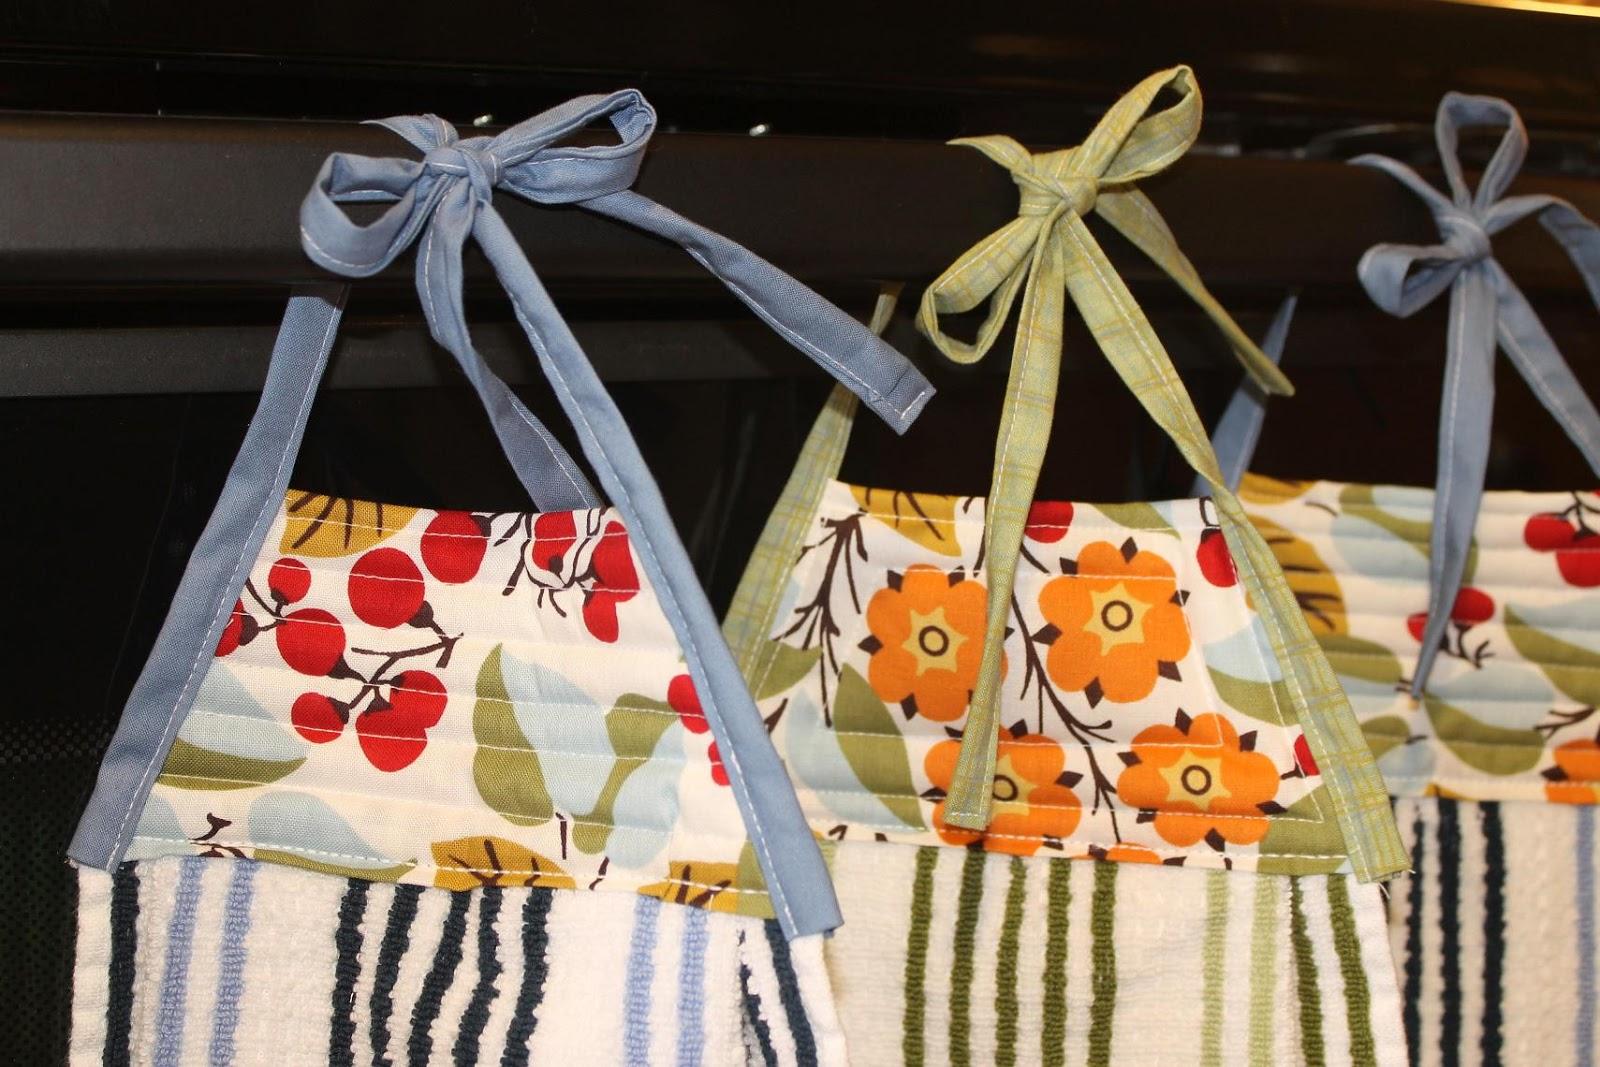 Superieur Hanging Kitchen Towels Tutorial